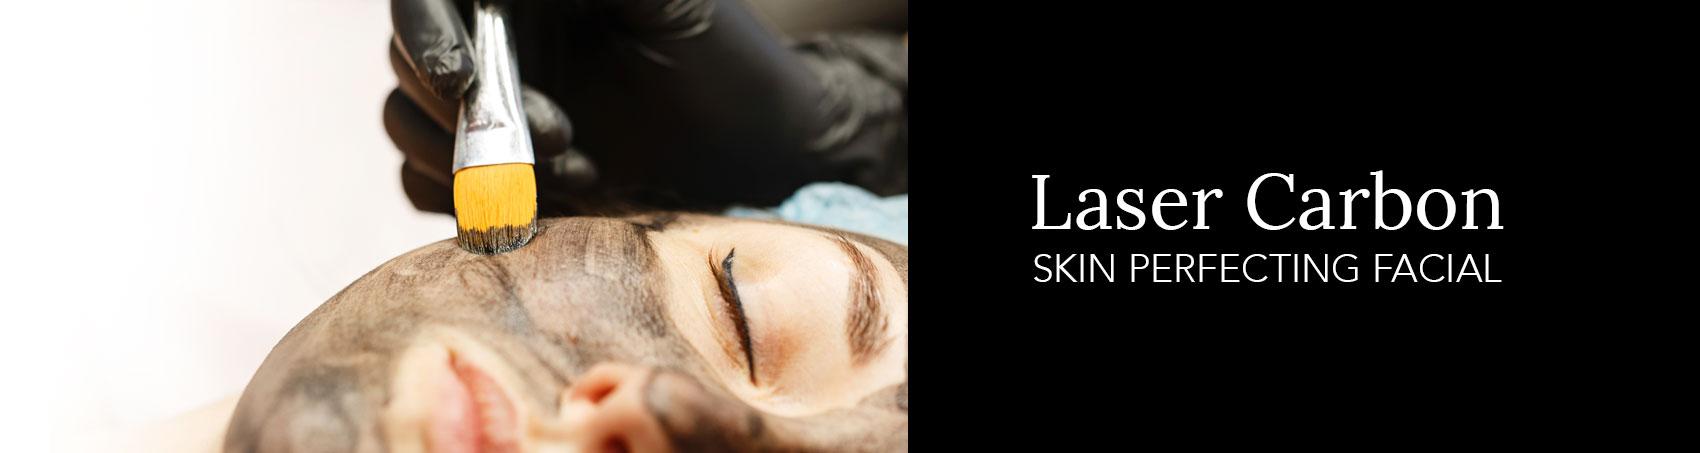 Geneo+ Radio frequency skin tightening facial